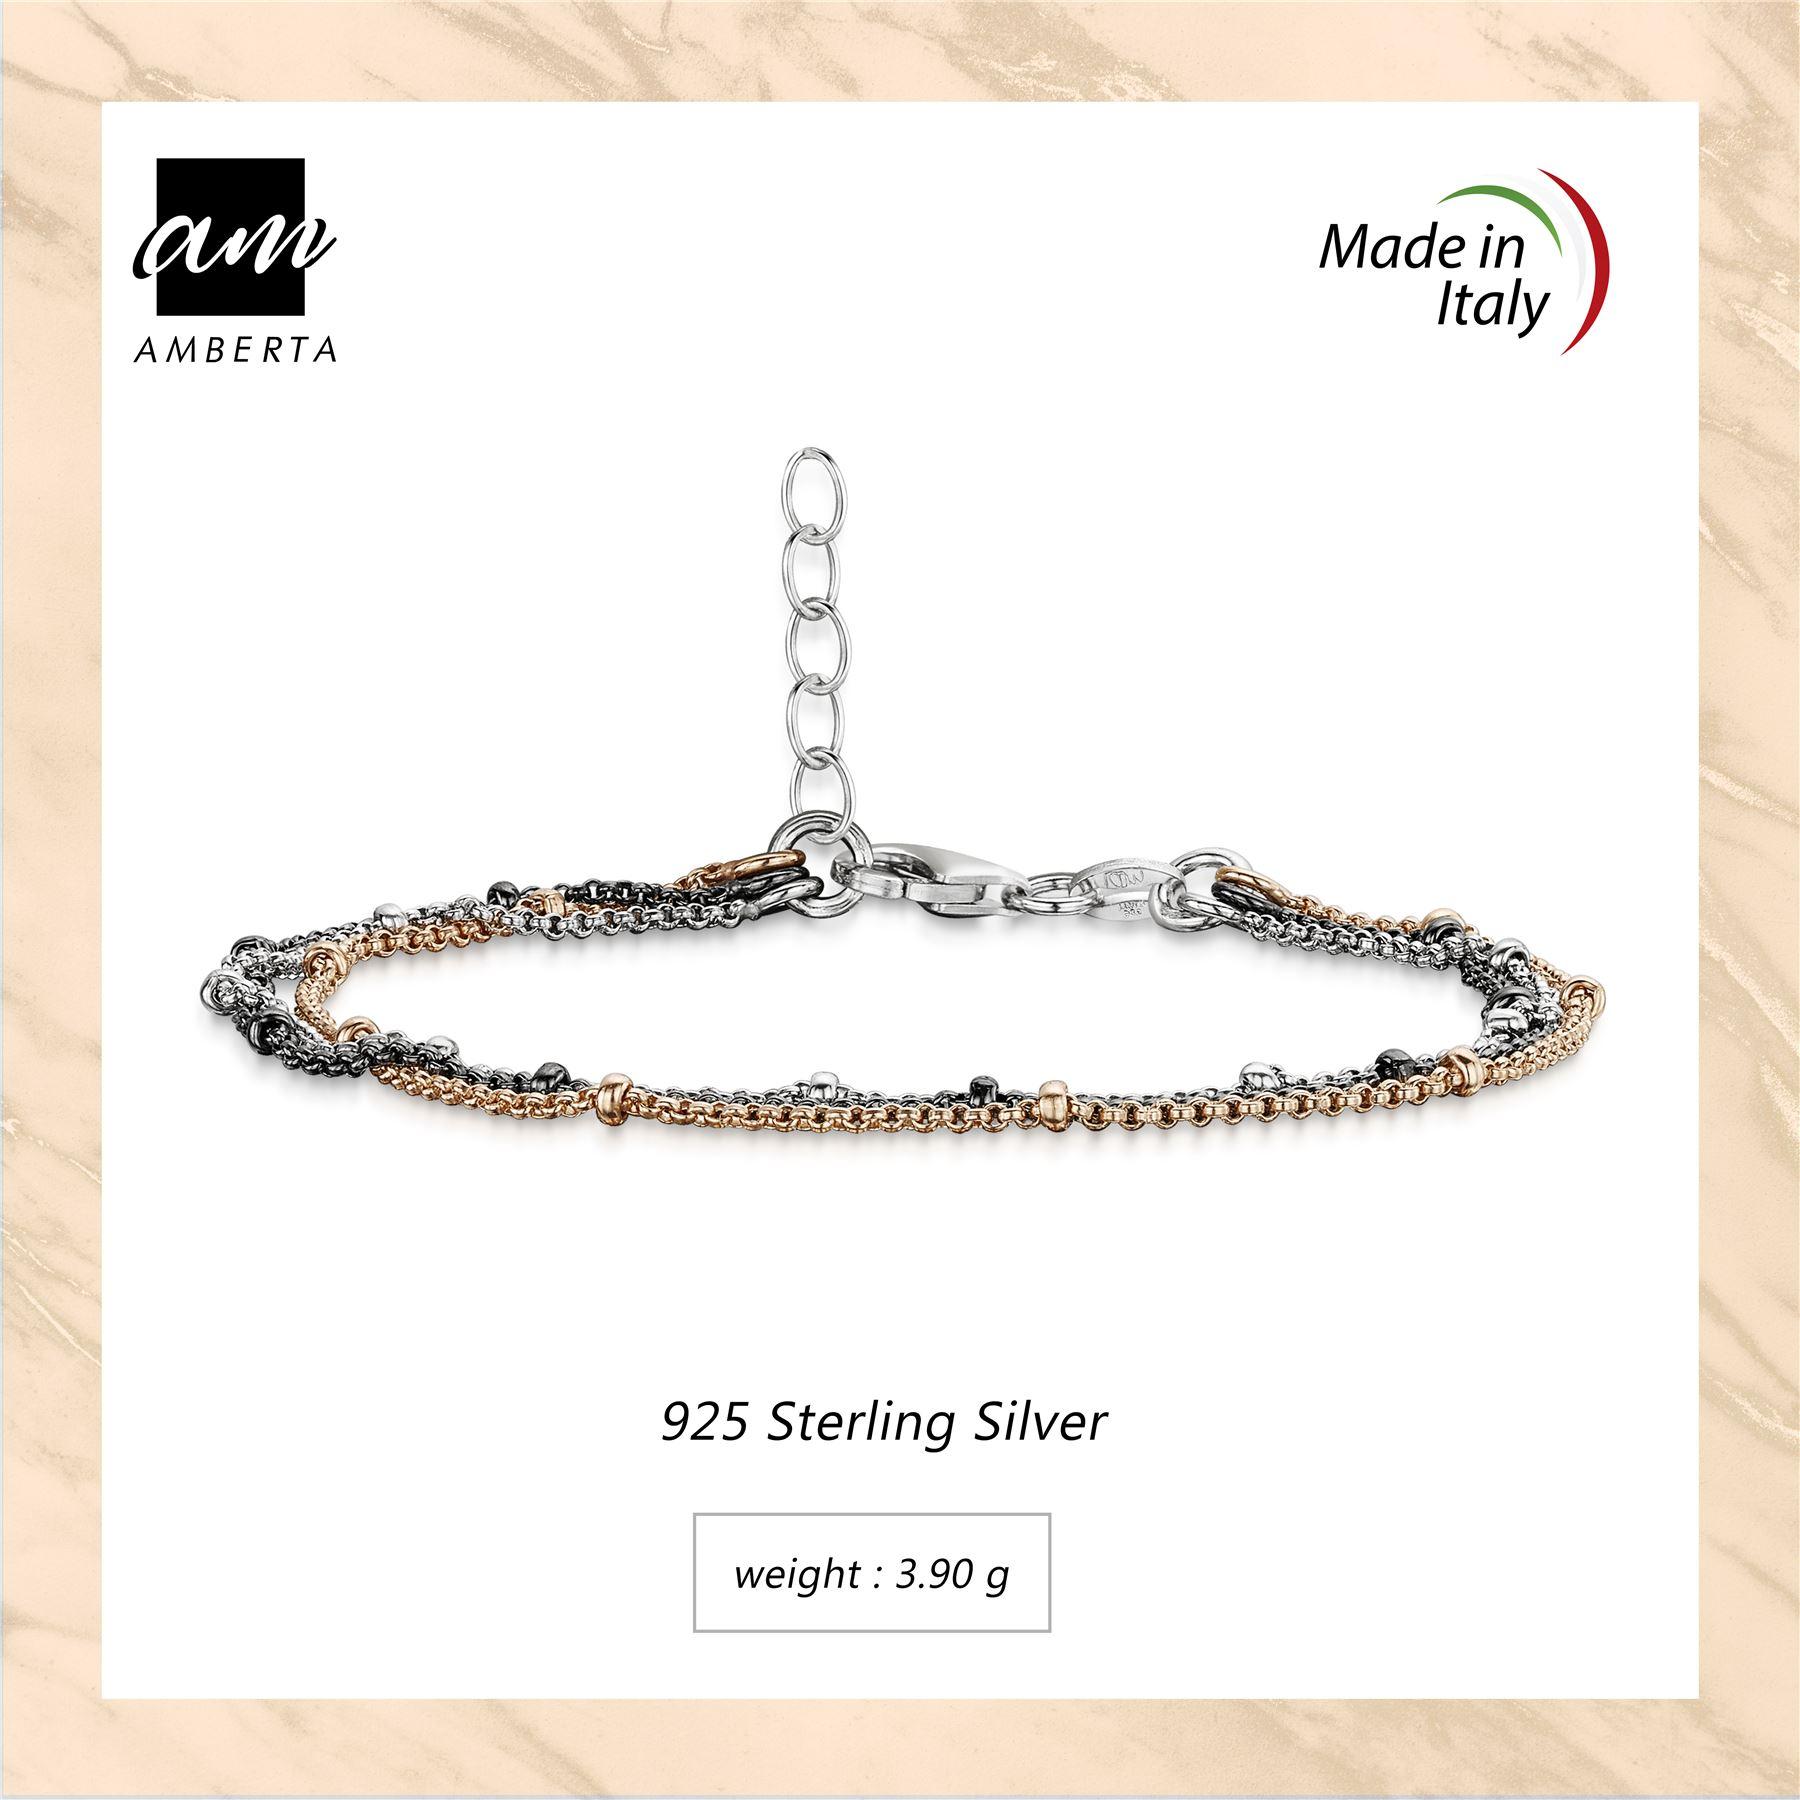 Amberta-925-Sterling-Silver-Adjustable-Multi-Layered-Chain-Bracelet-for-Women miniature 15